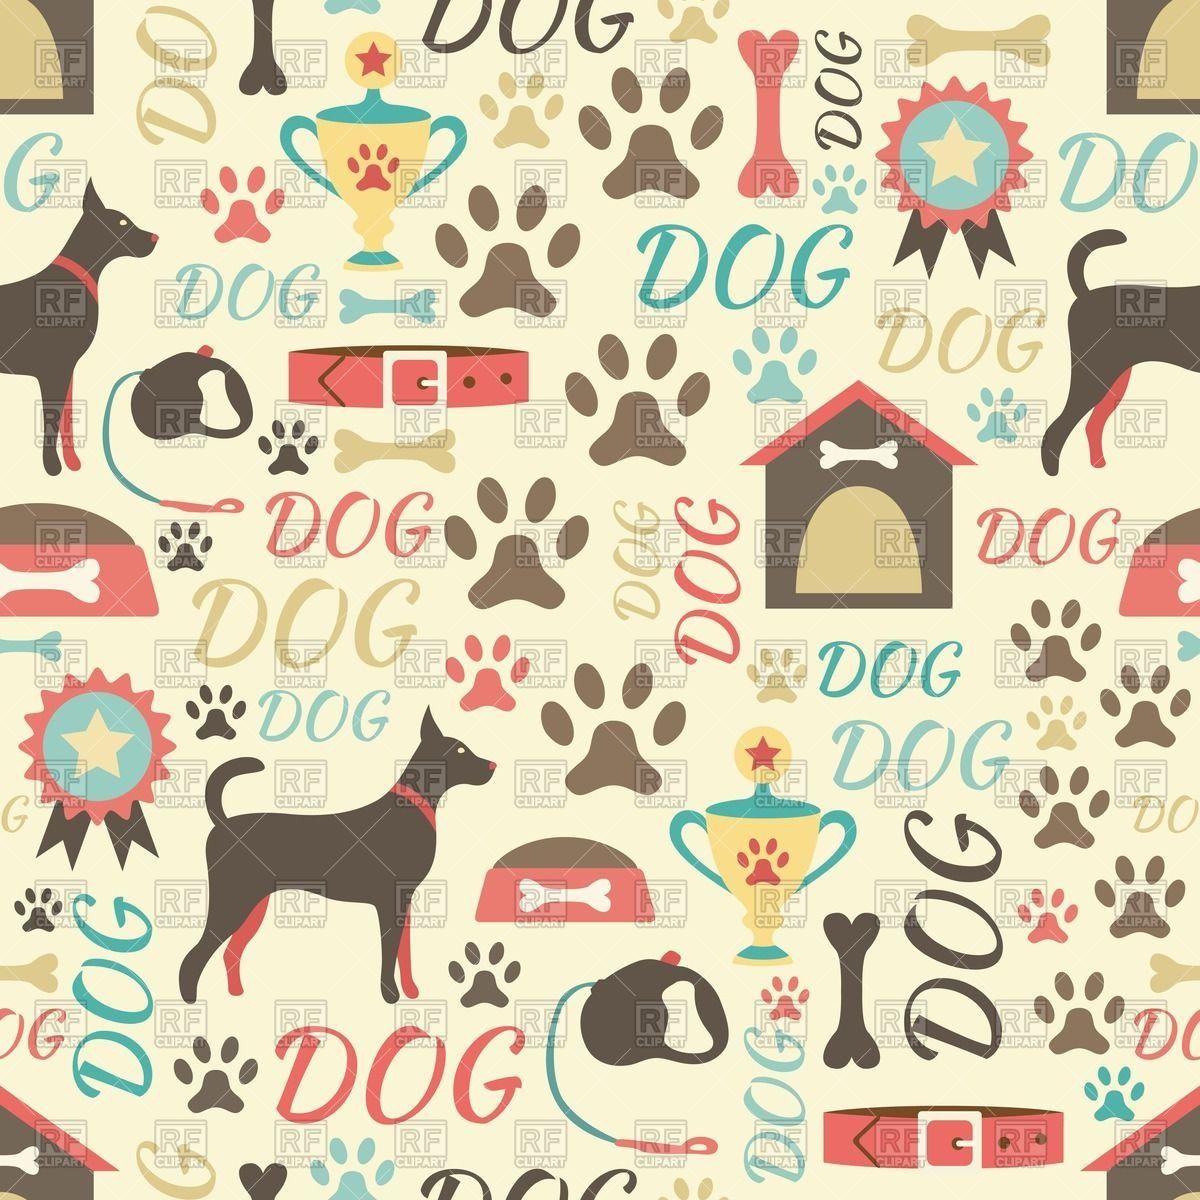 Dog paws wallpaper wallpapersafari dog quilts fabric - Dog print wallpaper ...